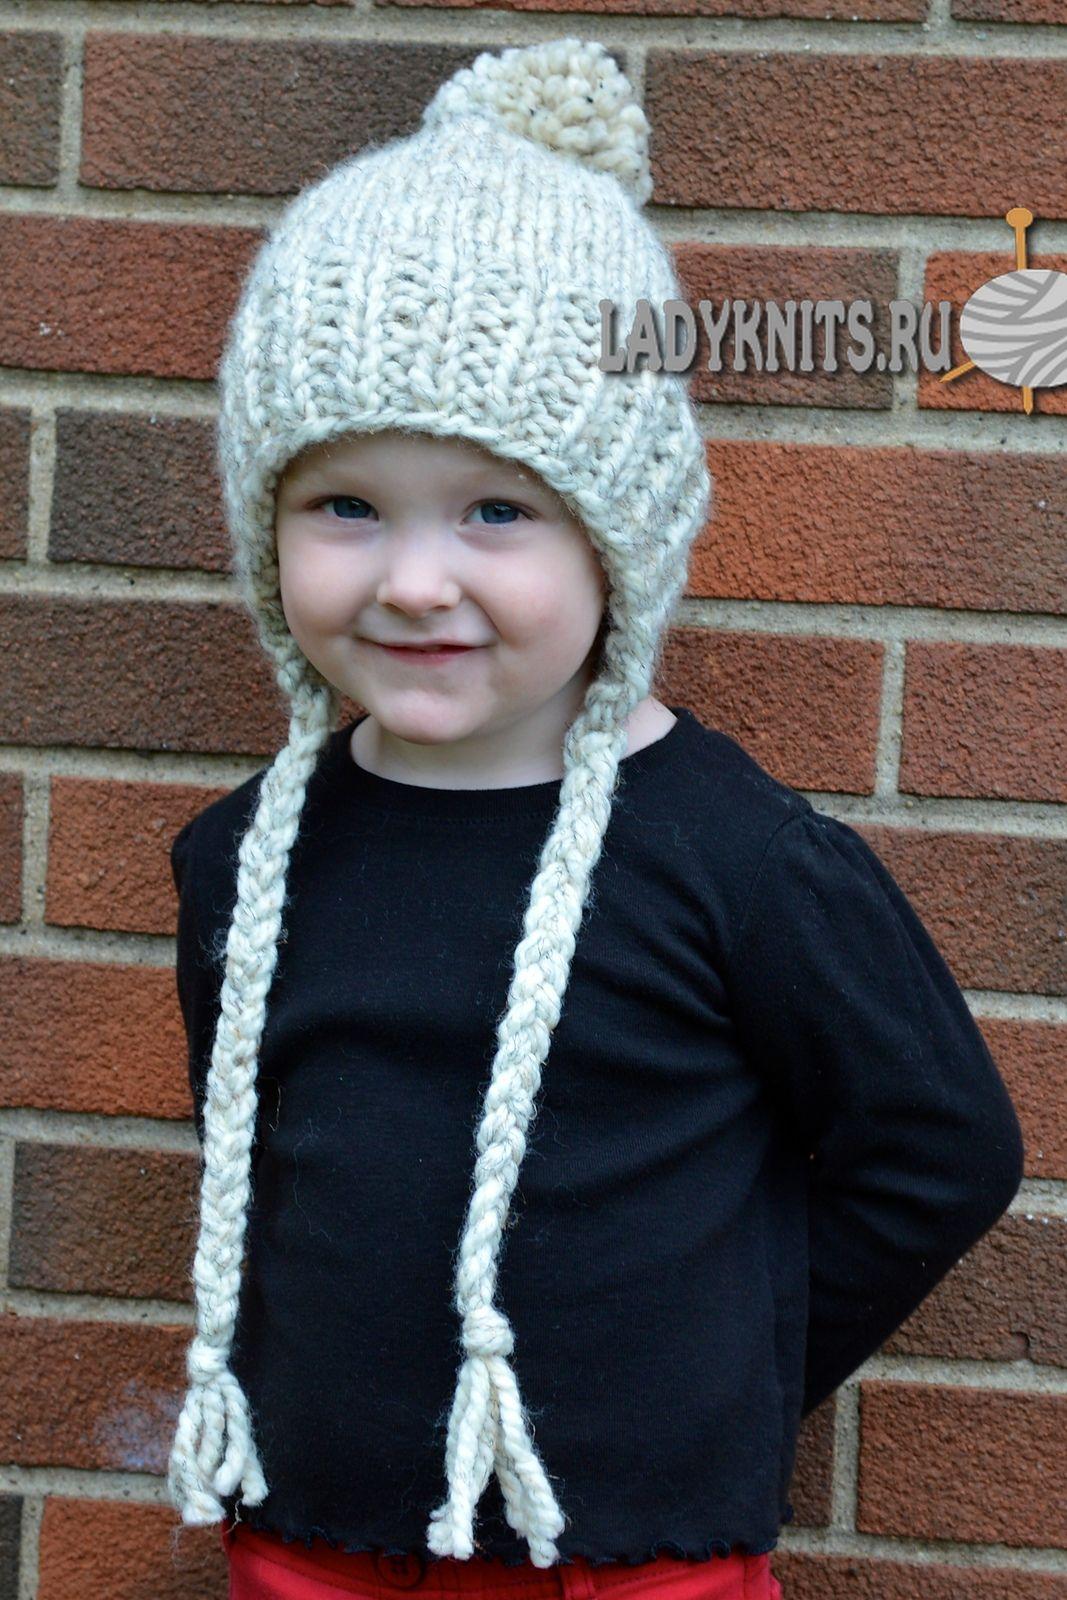 вязаная спицами теплая детская шапочка с завязками аксессуары